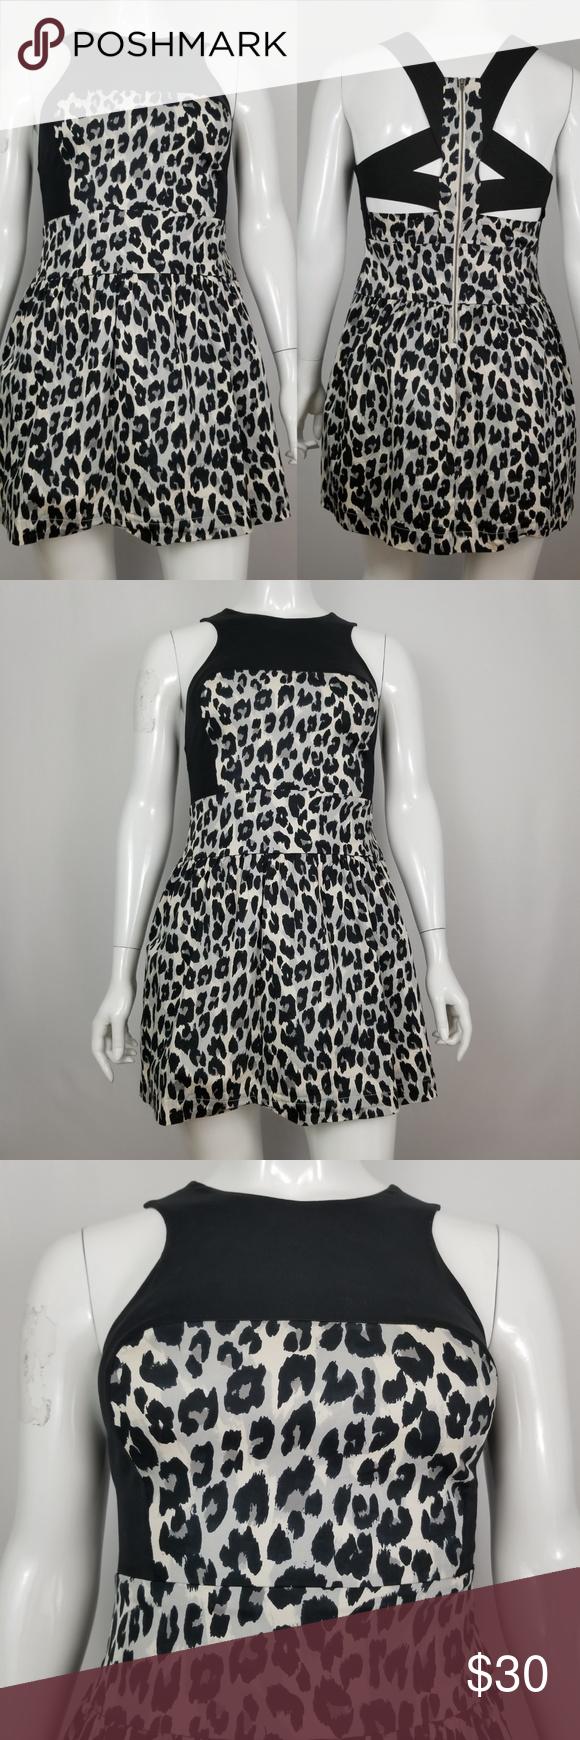 French Connection Leopard Print Dress Leopard Print Dress Print Dress Dress Brands [ 1740 x 580 Pixel ]